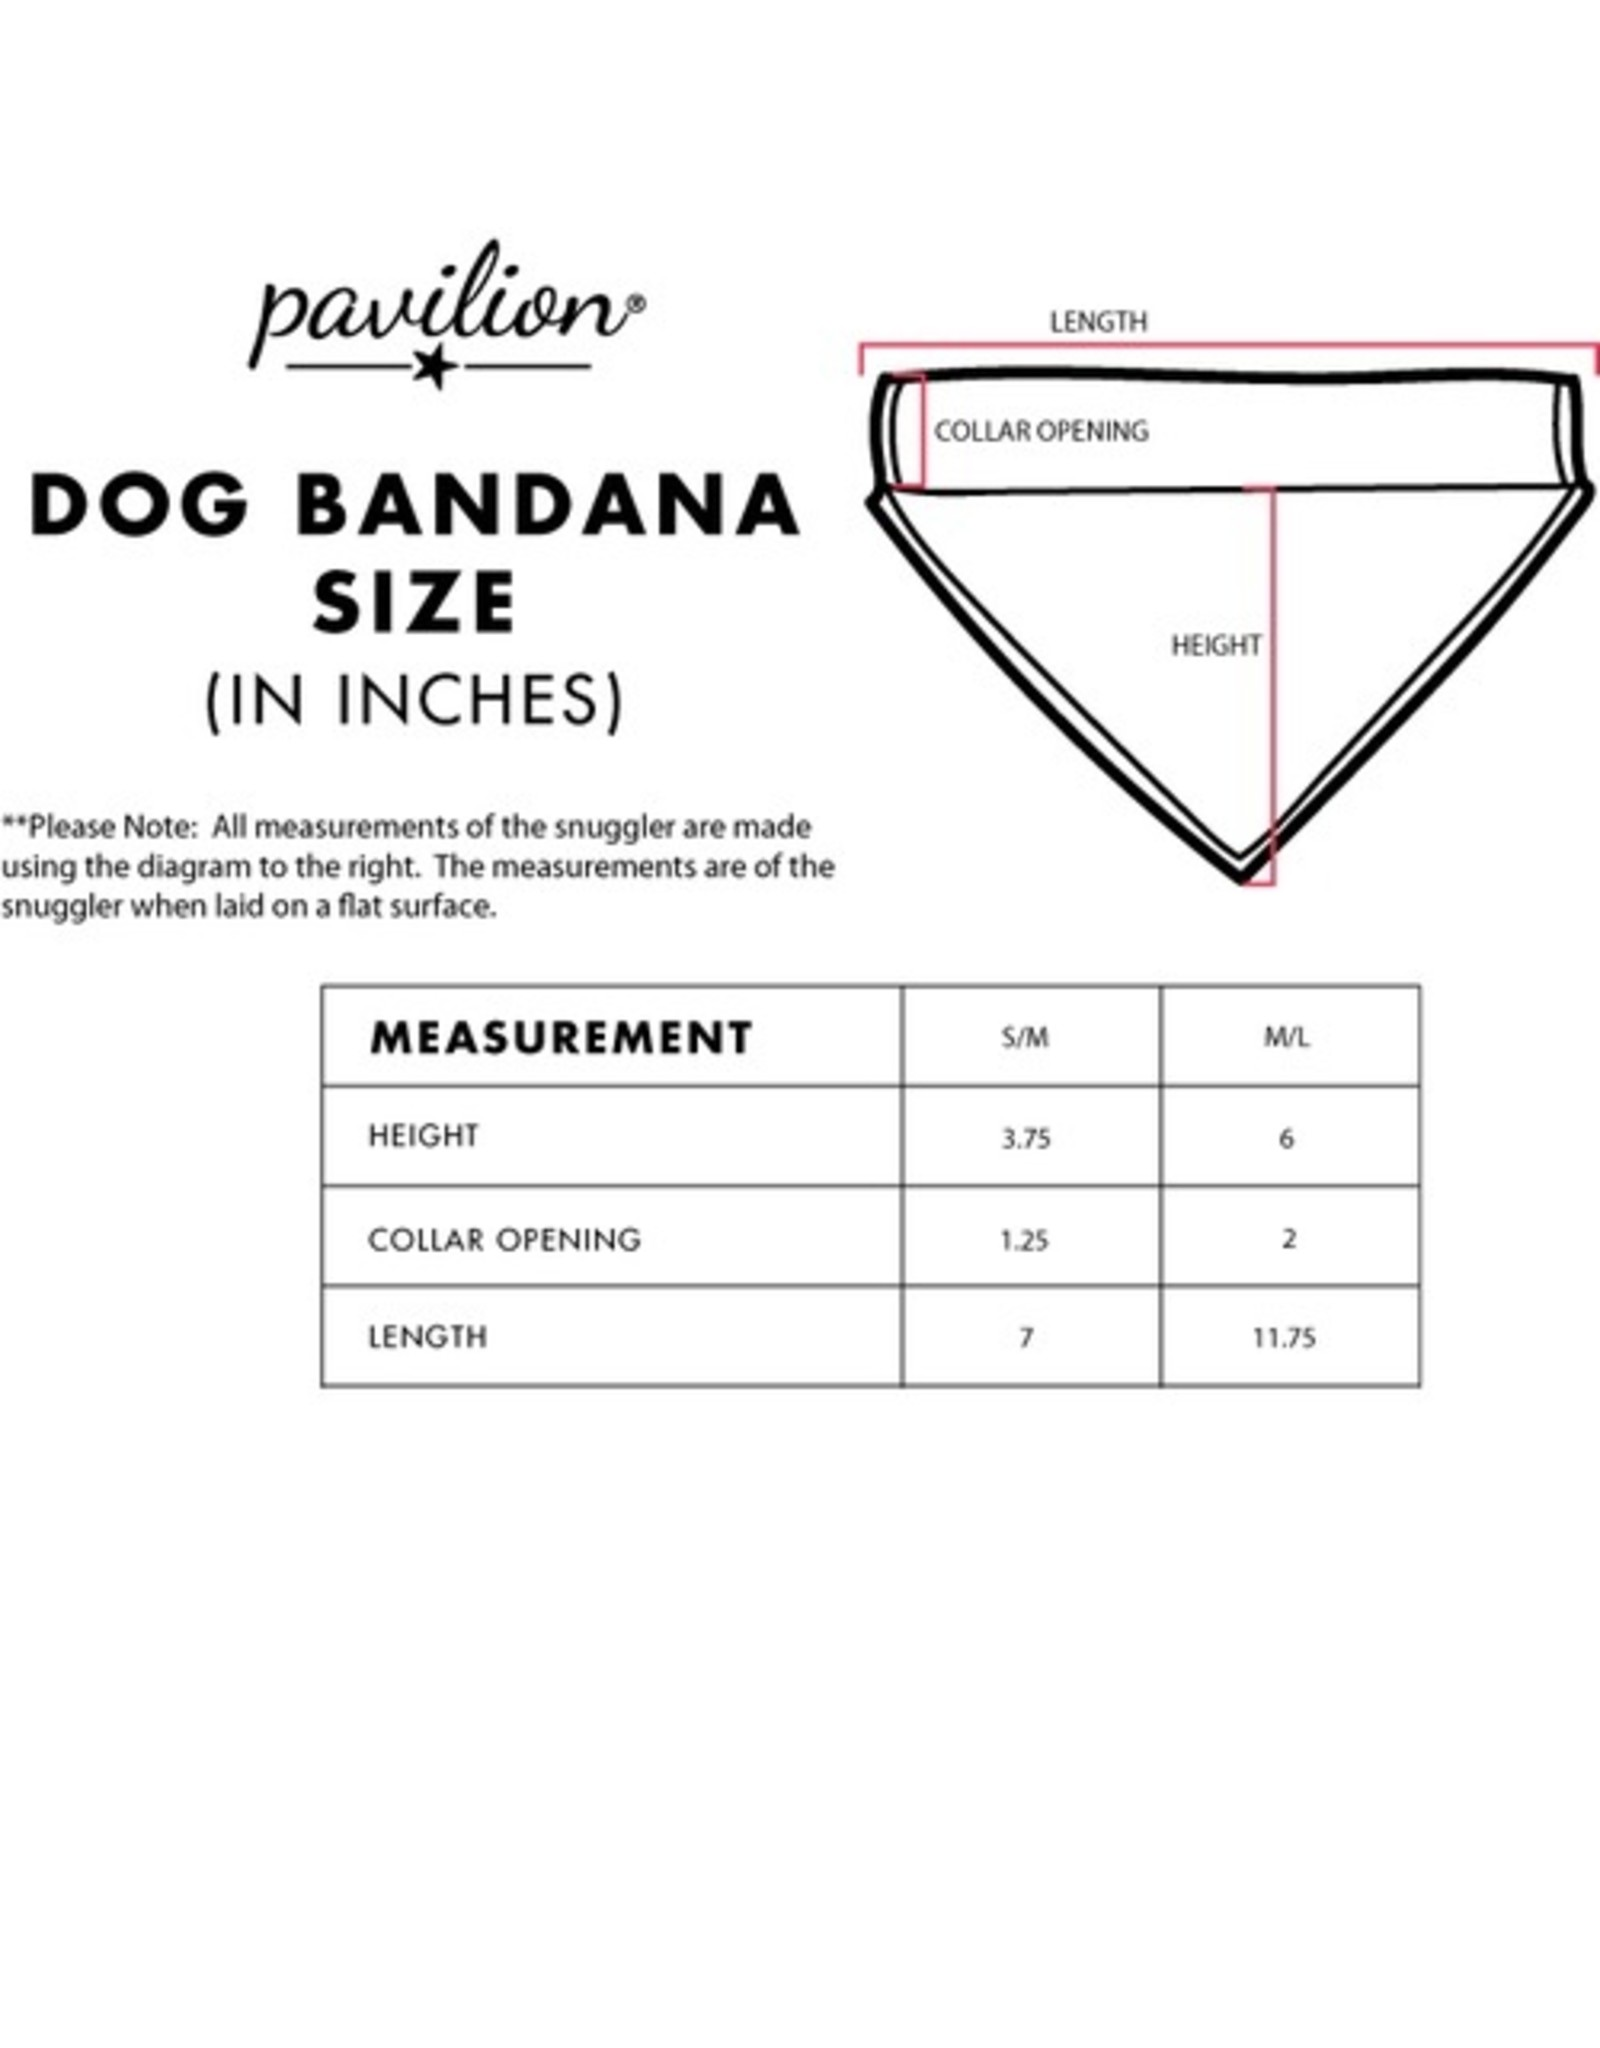 Pavilion Gift CANVAS PET BANDANA